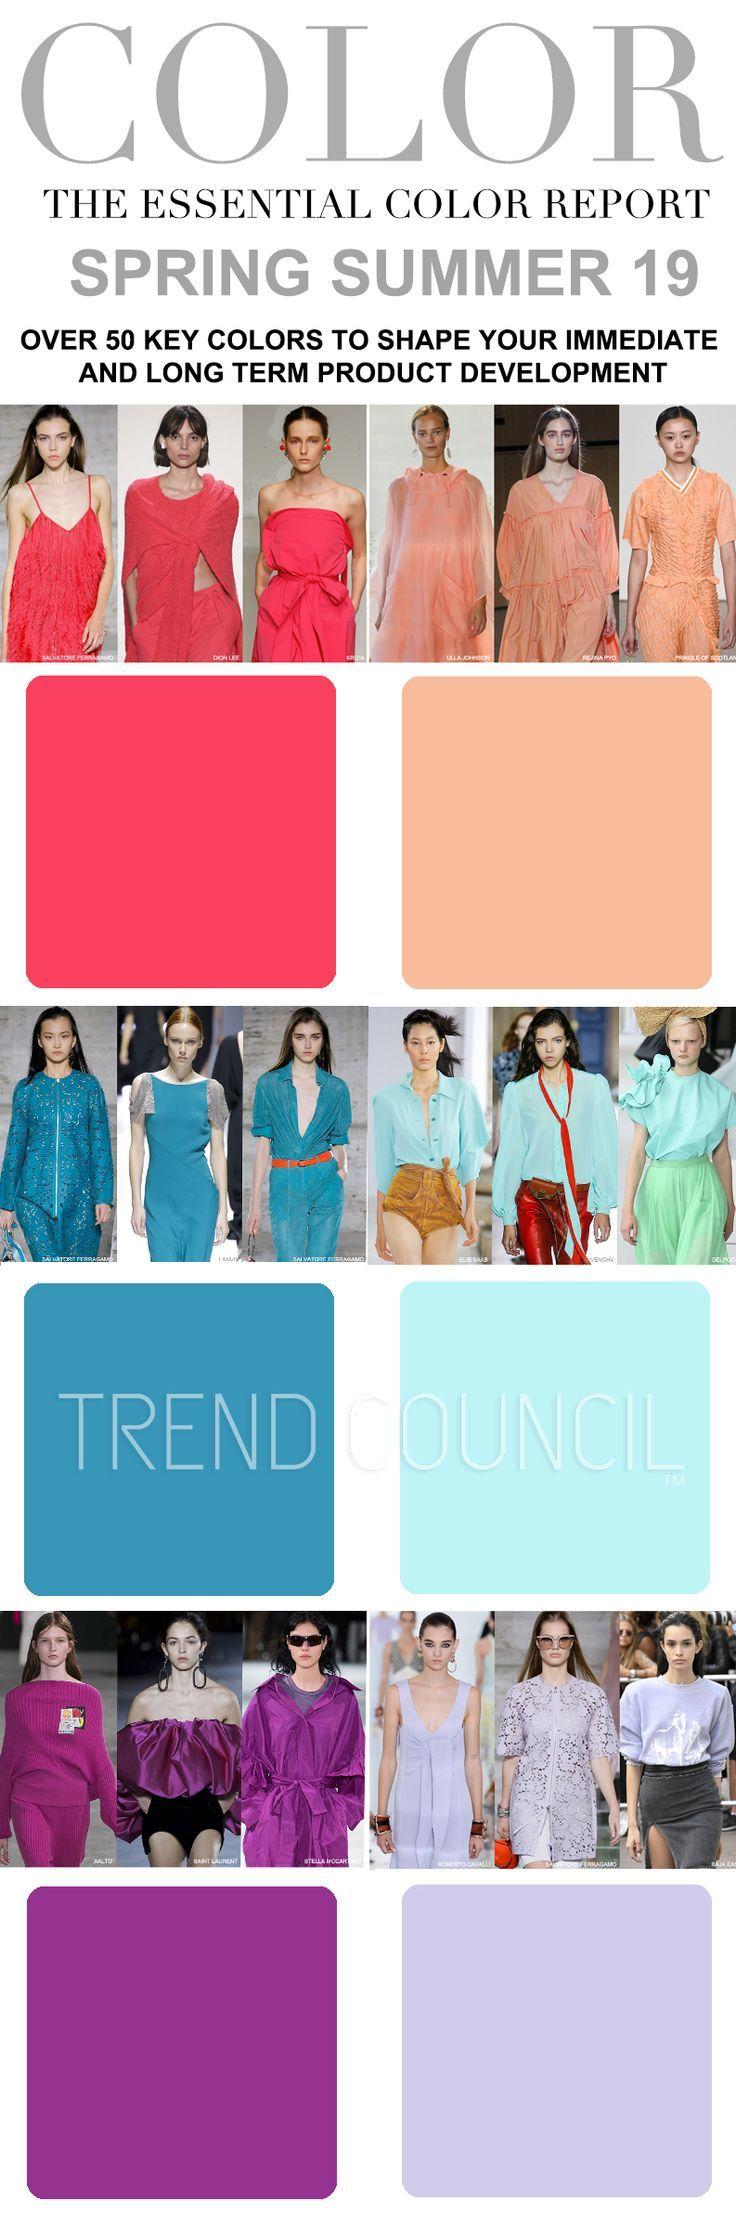 images Spring-Summer 2019 Color Trends